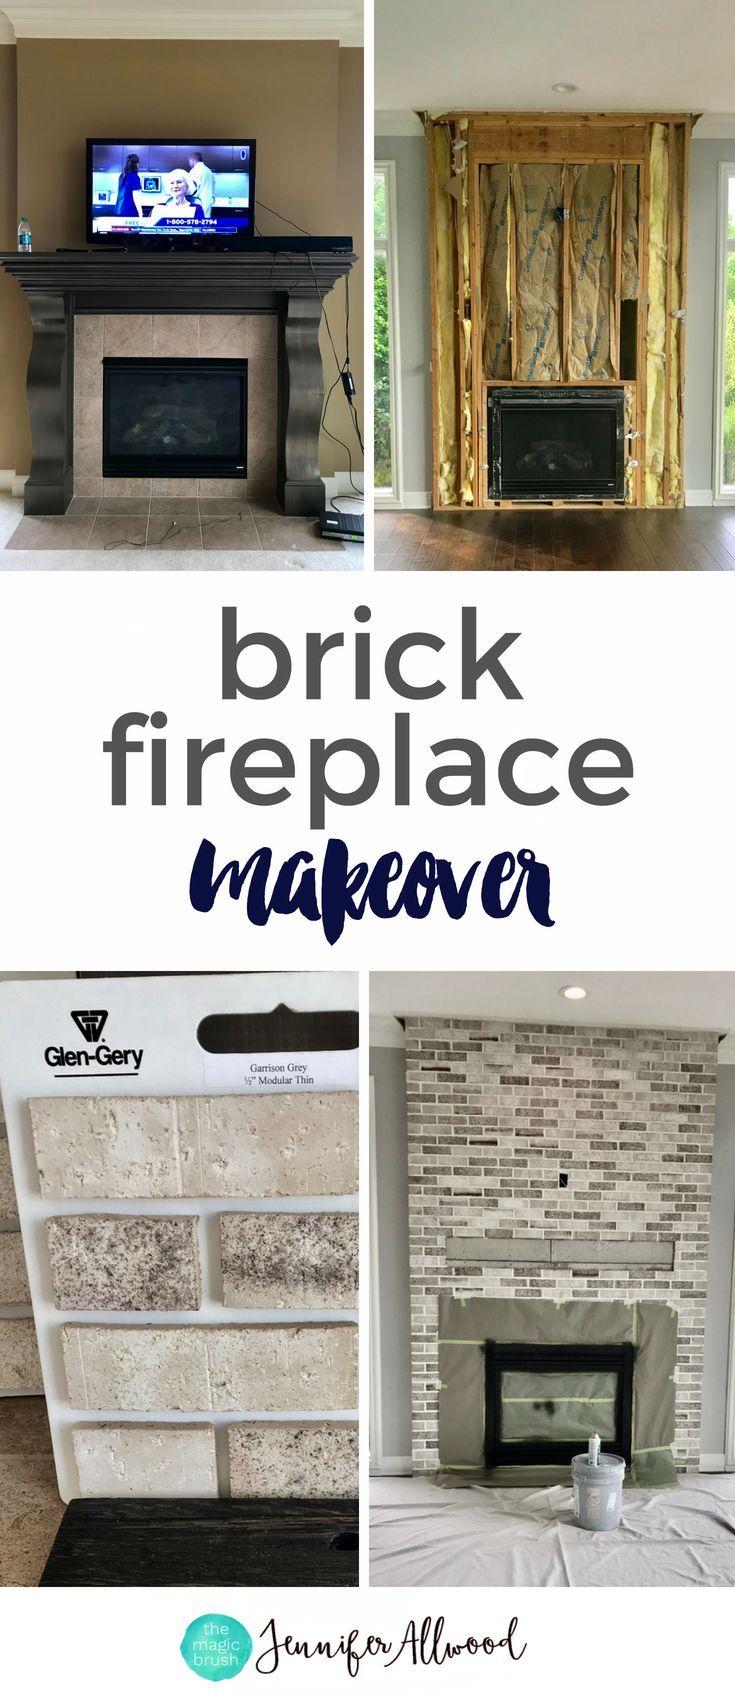 A Light Brick Fireplace Makeover By Brick Fireplace Makeover